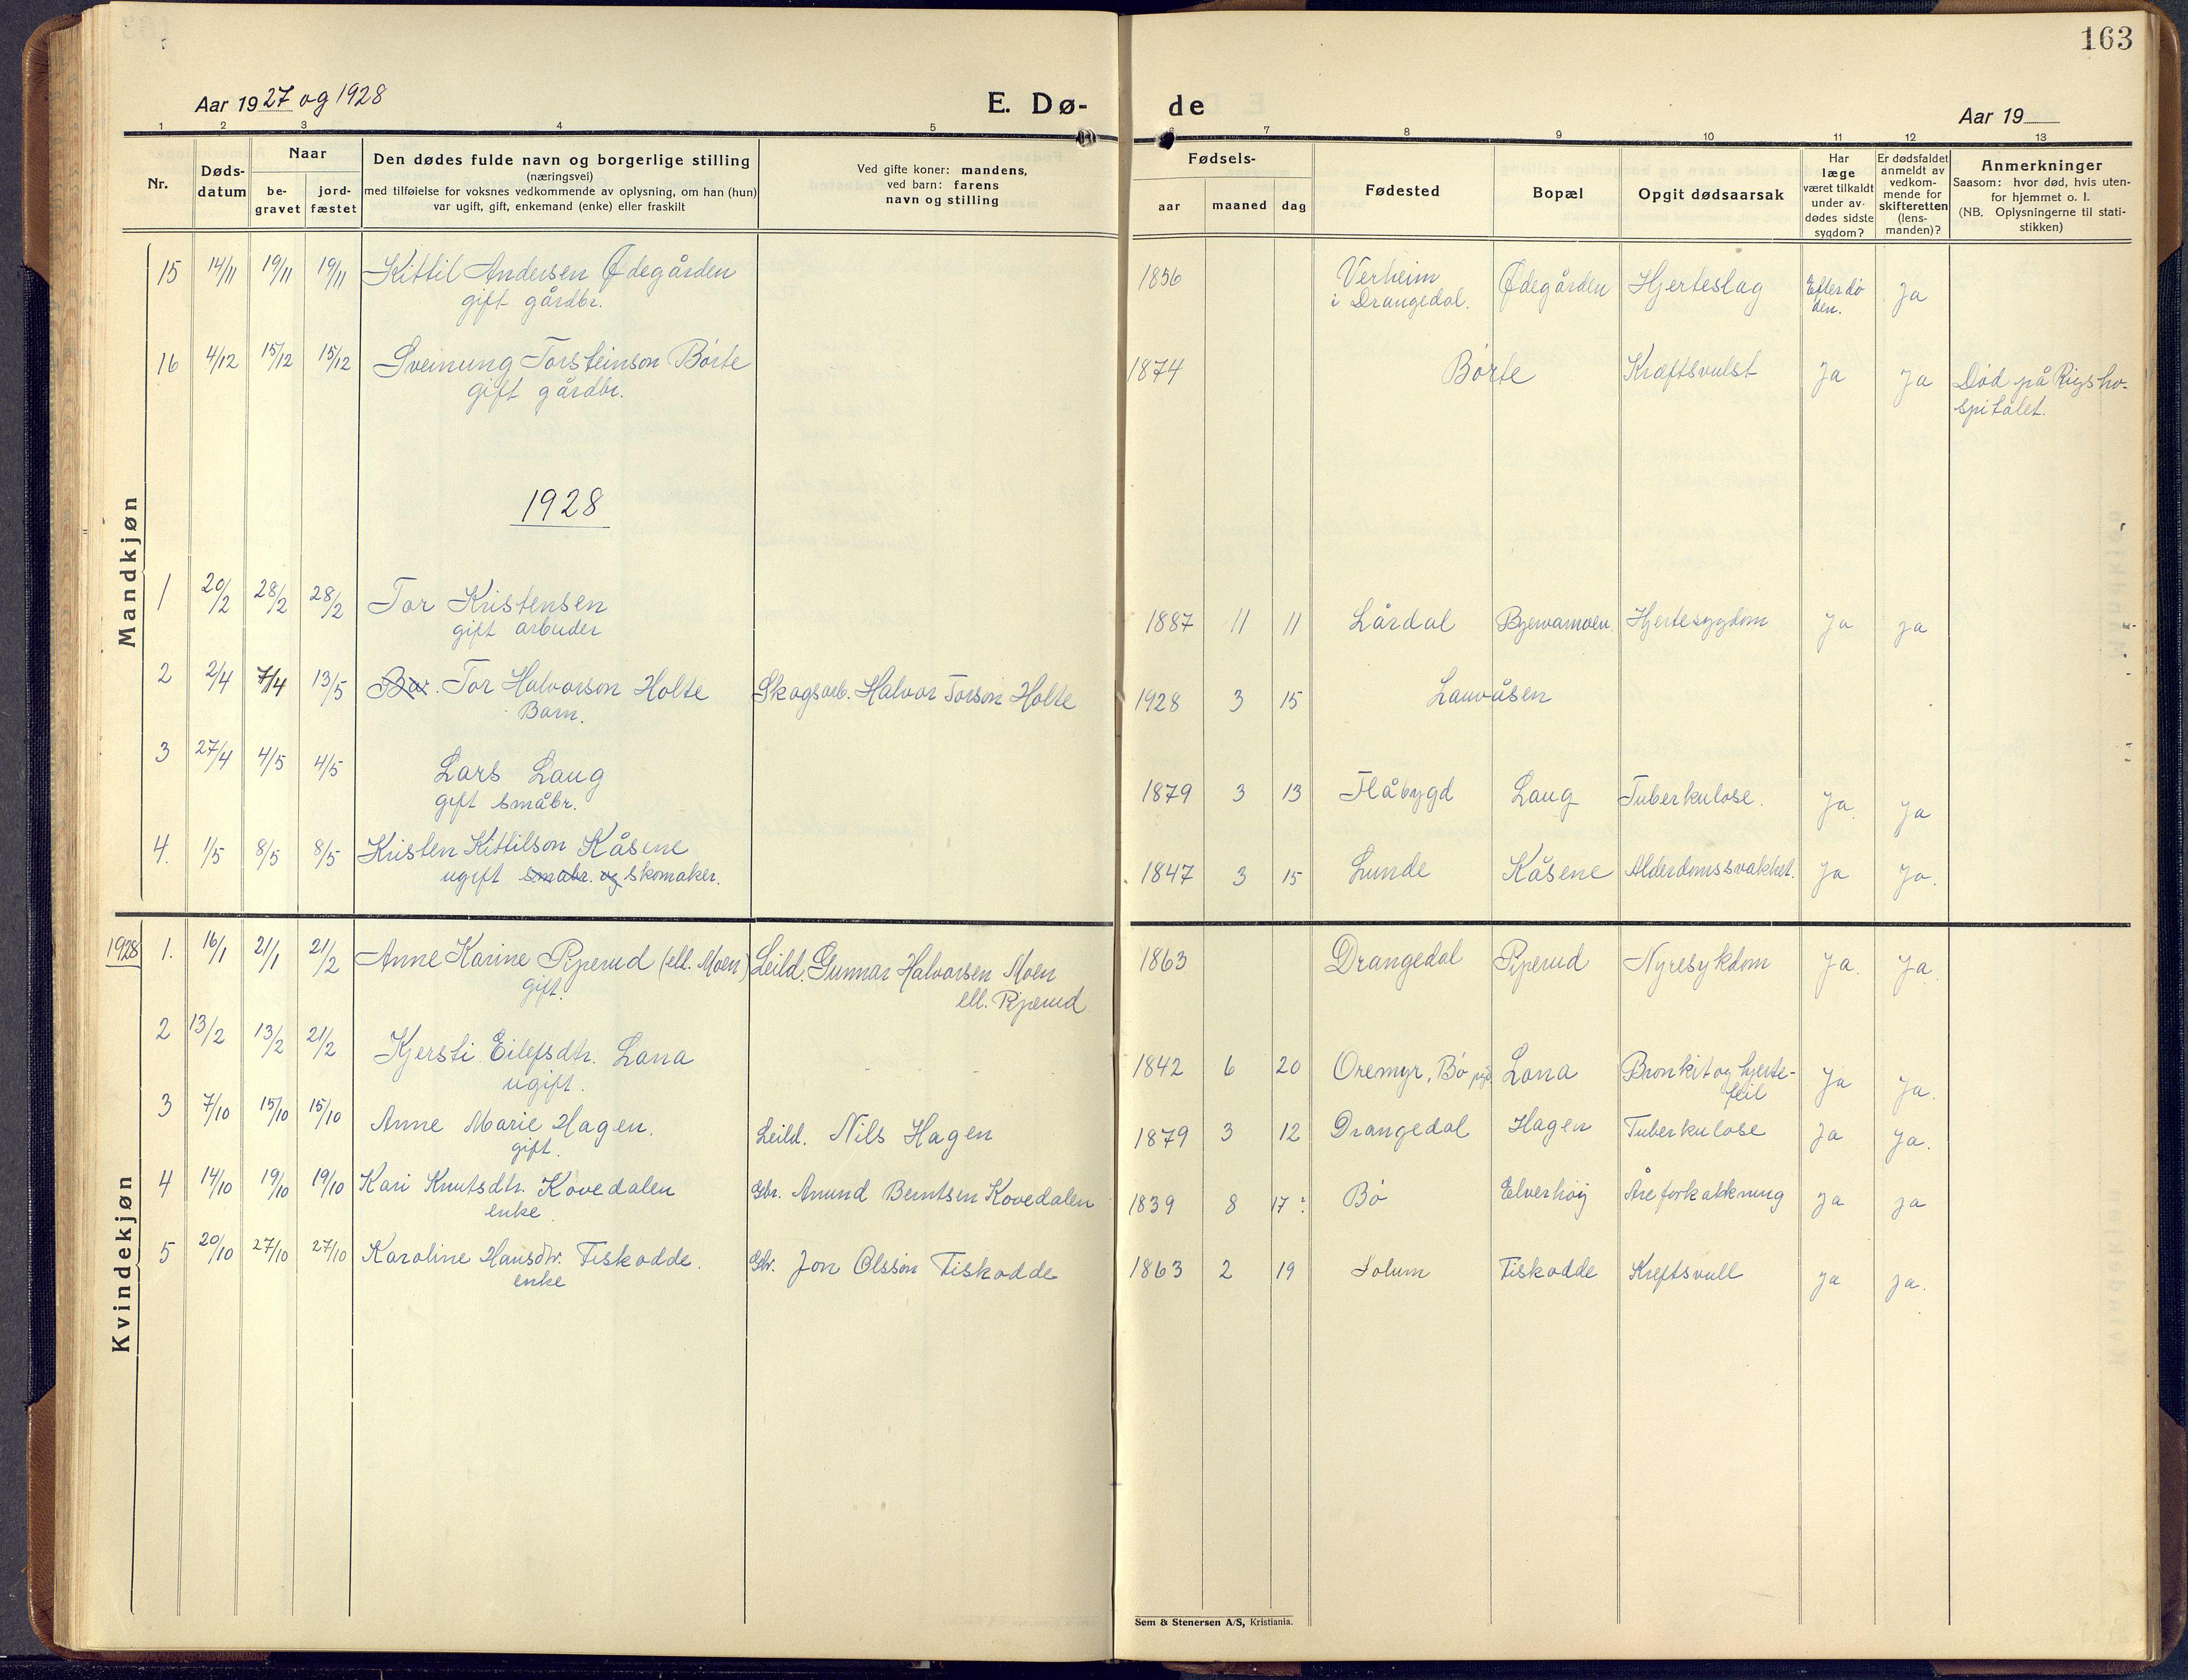 SAKO, Lunde kirkebøker, F/Fa/L0006: Ministerialbok nr. I 6, 1922-1940, s. 163